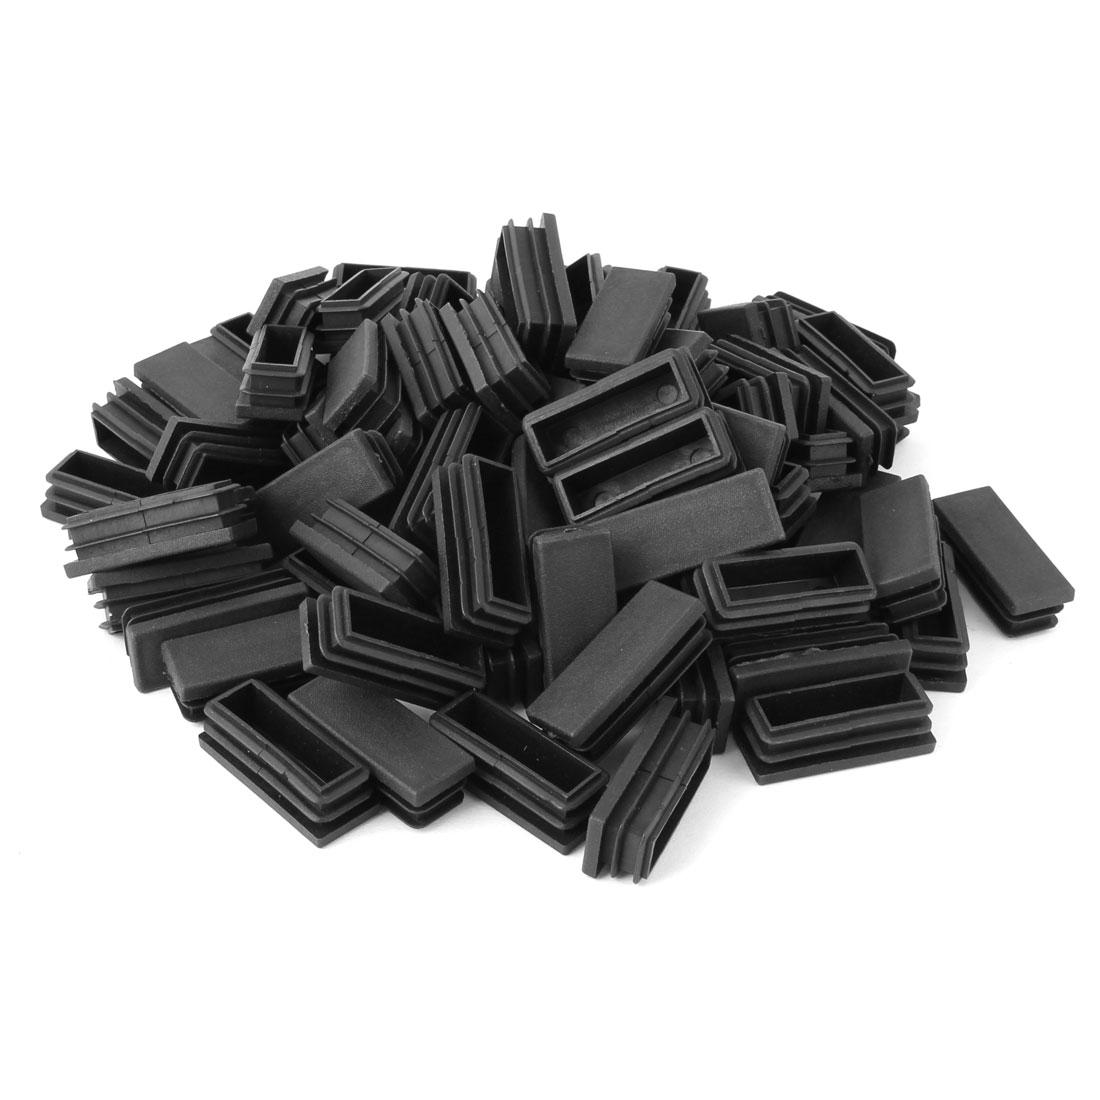 Home Plastic Rectangle Floor Protecting Furniture Table Leg Tube Inserts Black 50 x 20mm 80pcs